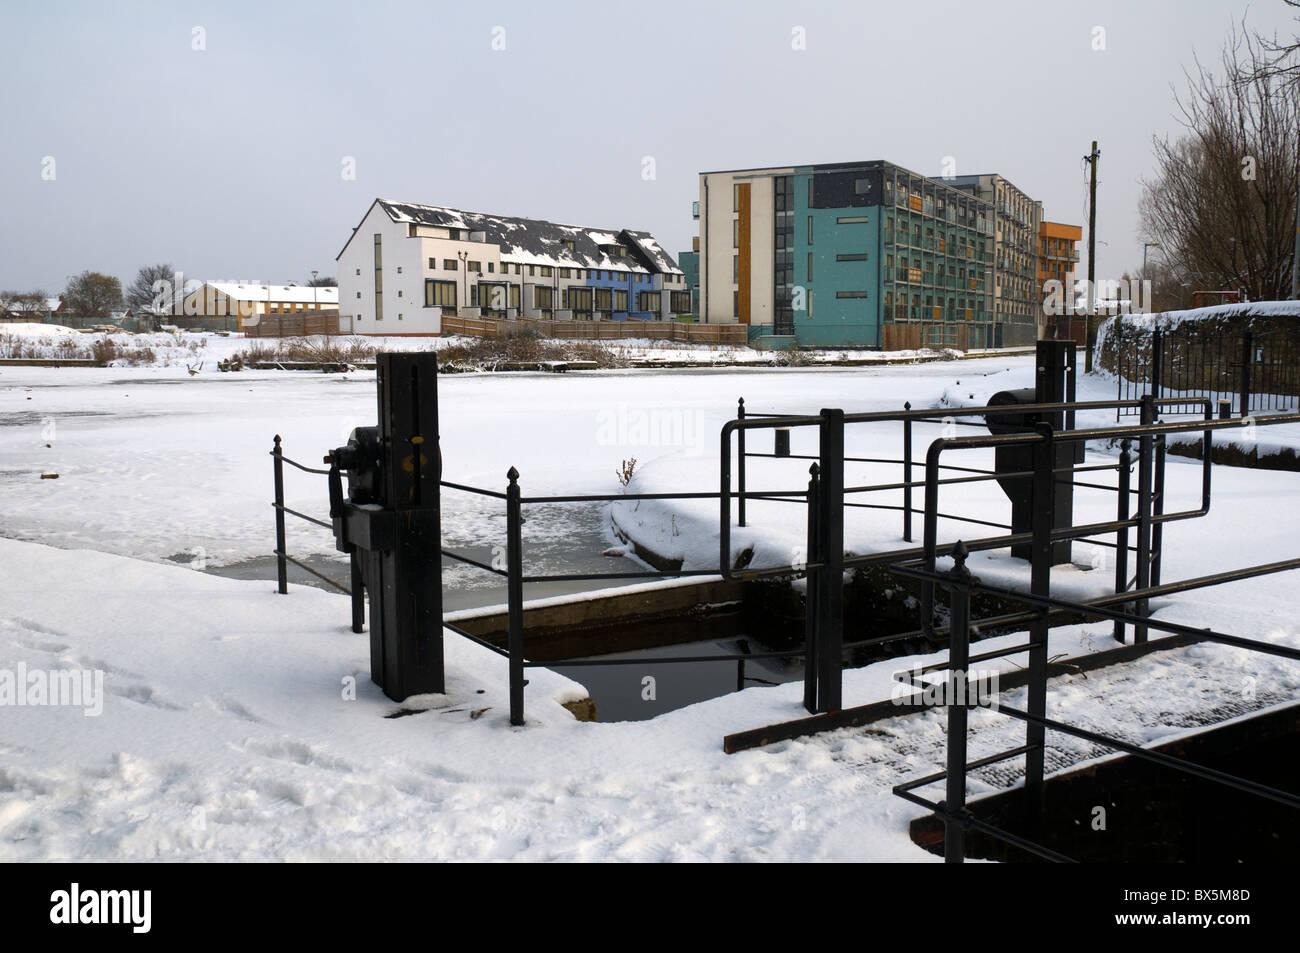 Apartments and frozen canal basin at Droylsden marina, Tameside, Manchester, England, UK - Stock Image